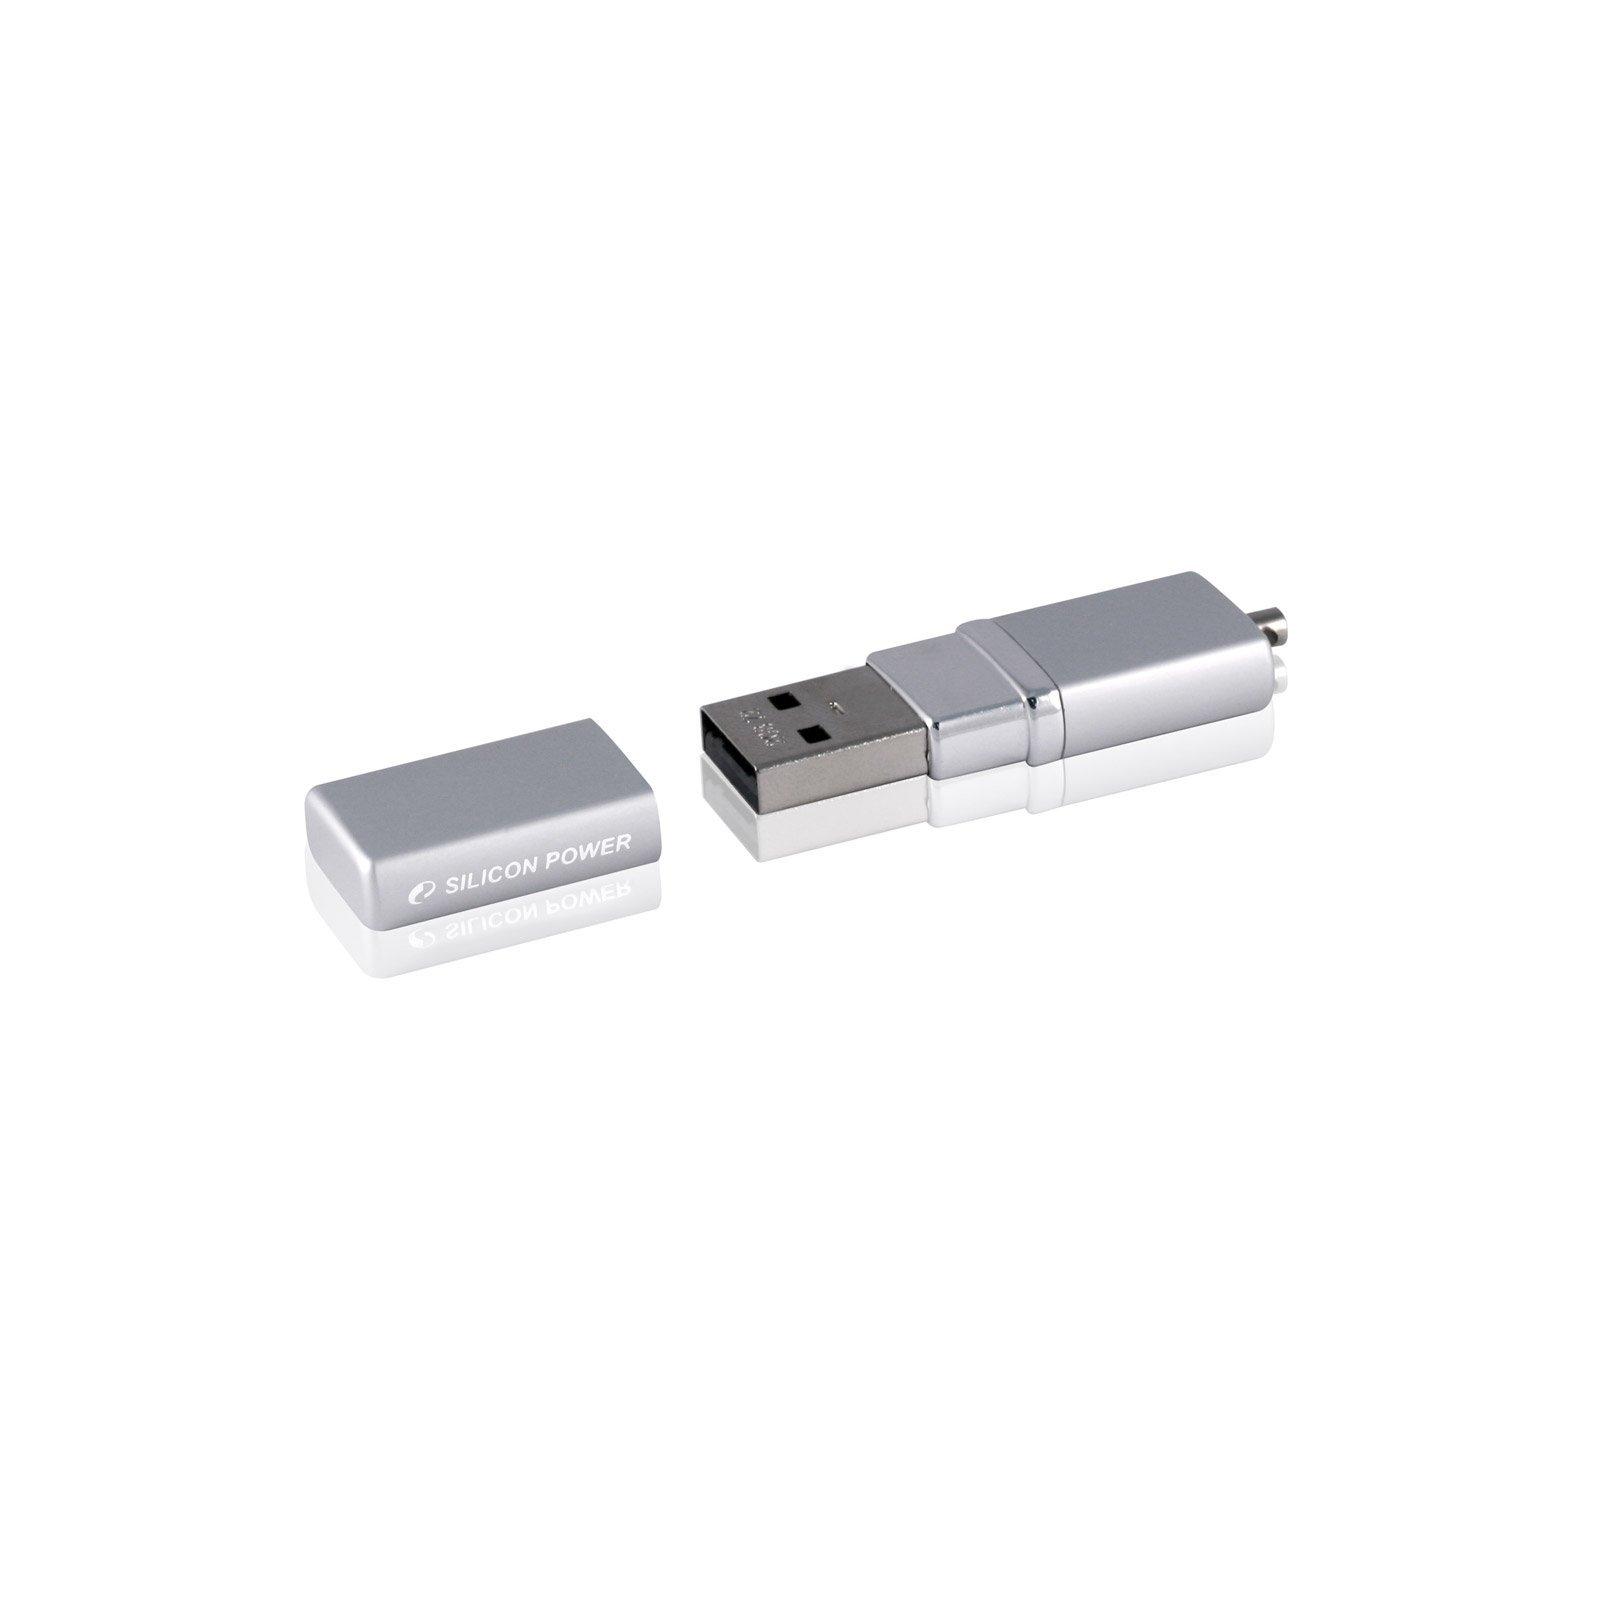 USB флеш накопитель Silicon Power 16Gb LuxMini 710 silver (SP016GBUF2710V1S) изображение 3